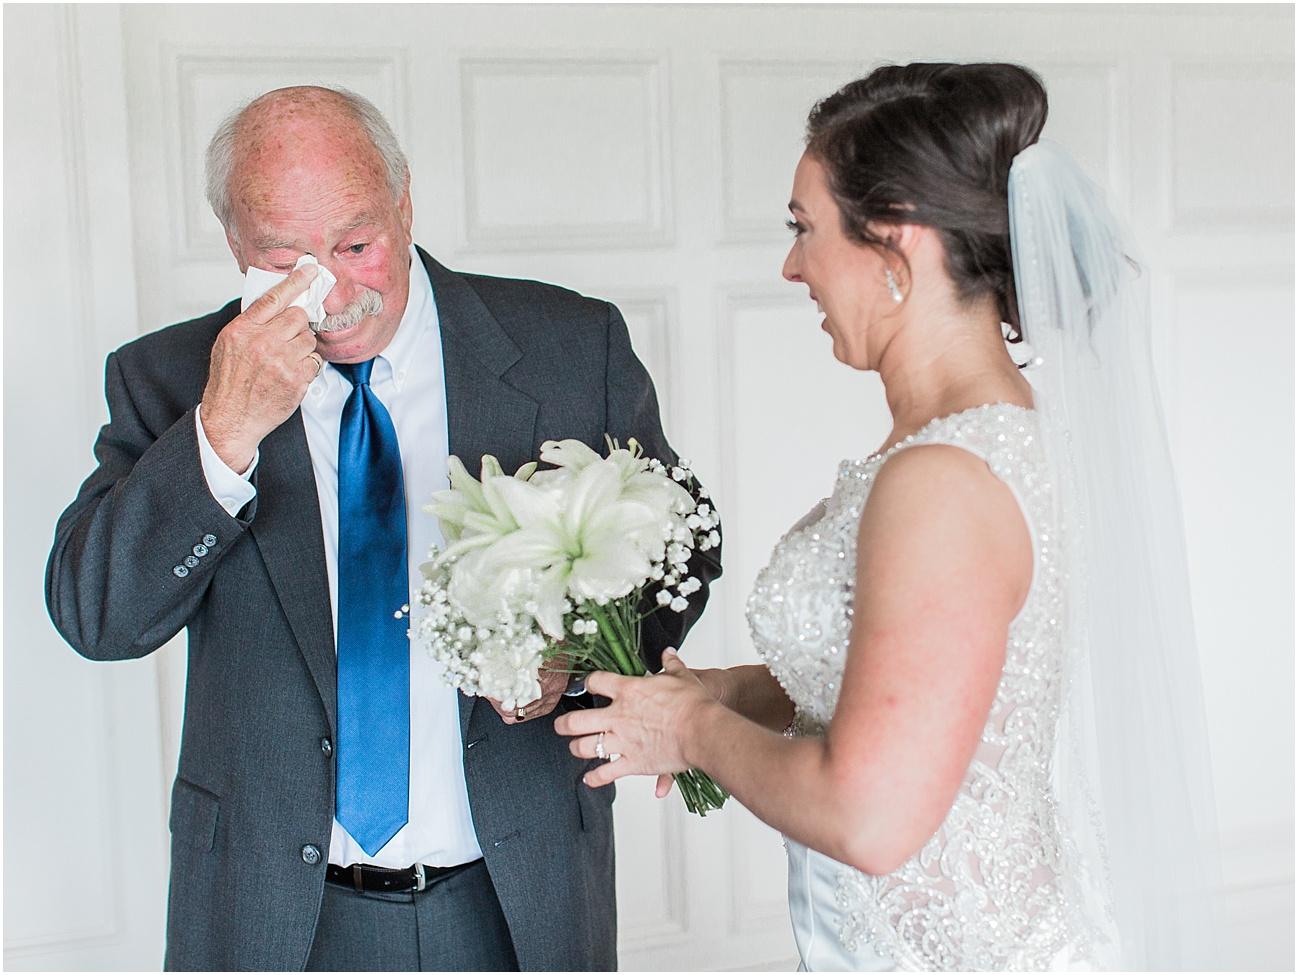 nicole_stephen_cape_club_nicky_falmouth_cod_boston_wedding_photographer_meredith_jane_photography_photo_0174.jpg